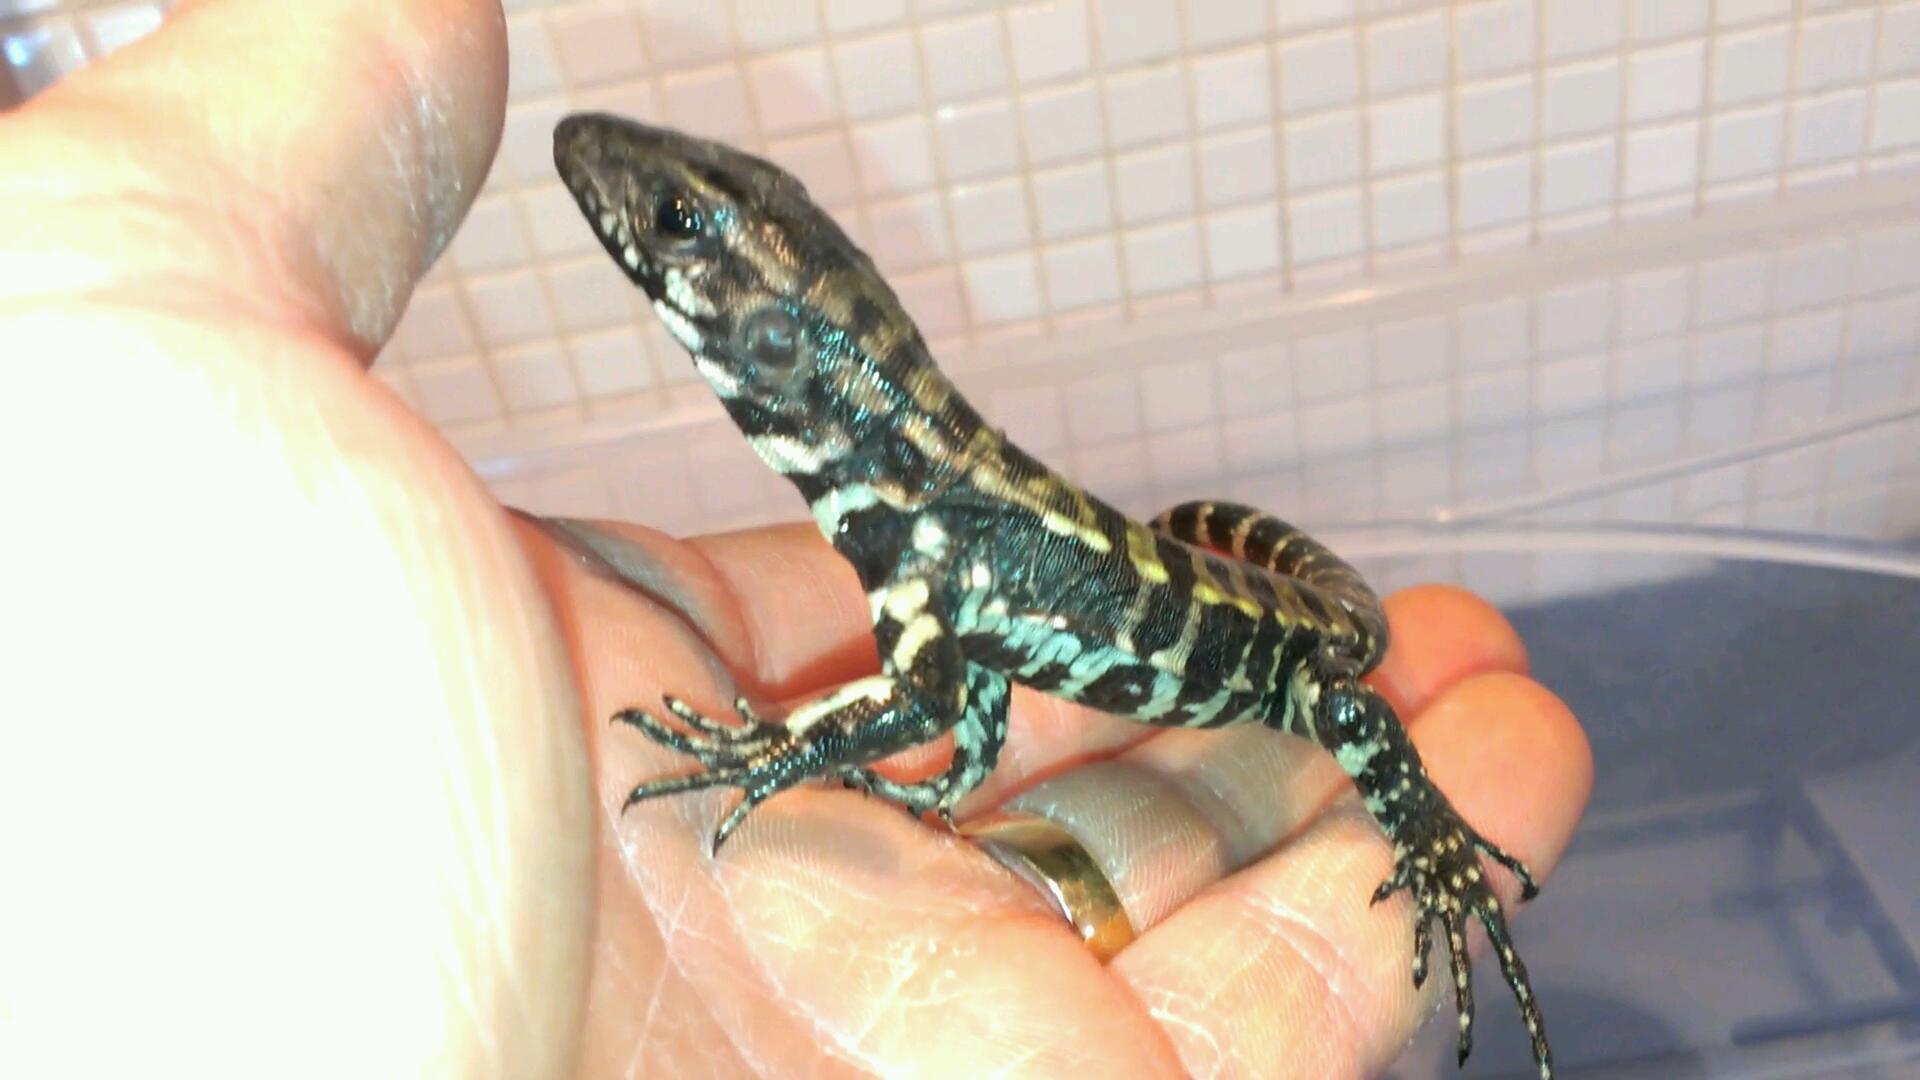 E Midlands blue tegu hatchlings for sale - Reptile Forums